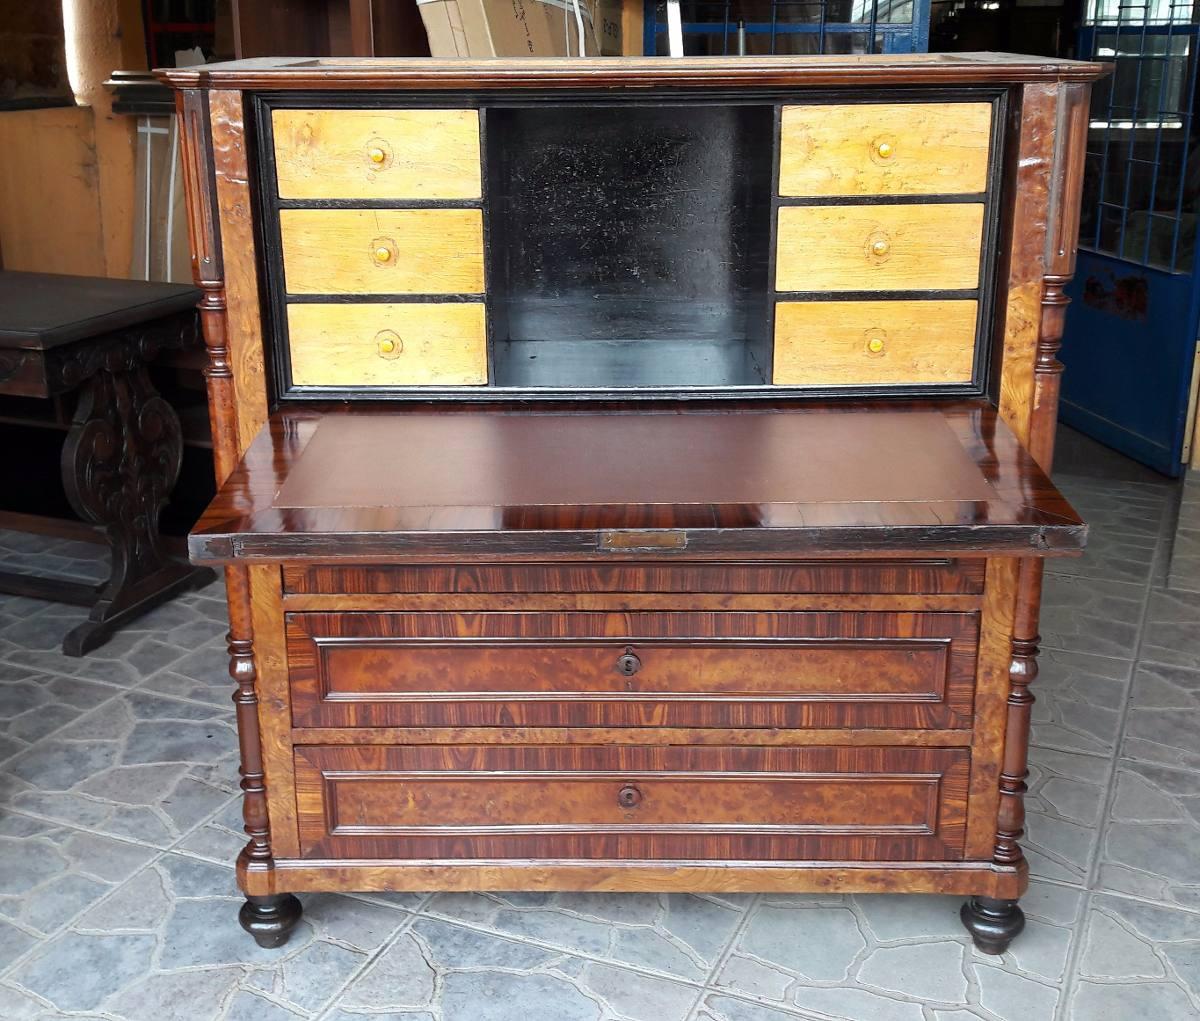 J c antiguo mueble secreter ingles puerta rebatible marmol en mercado libre - Mueble secreter ...